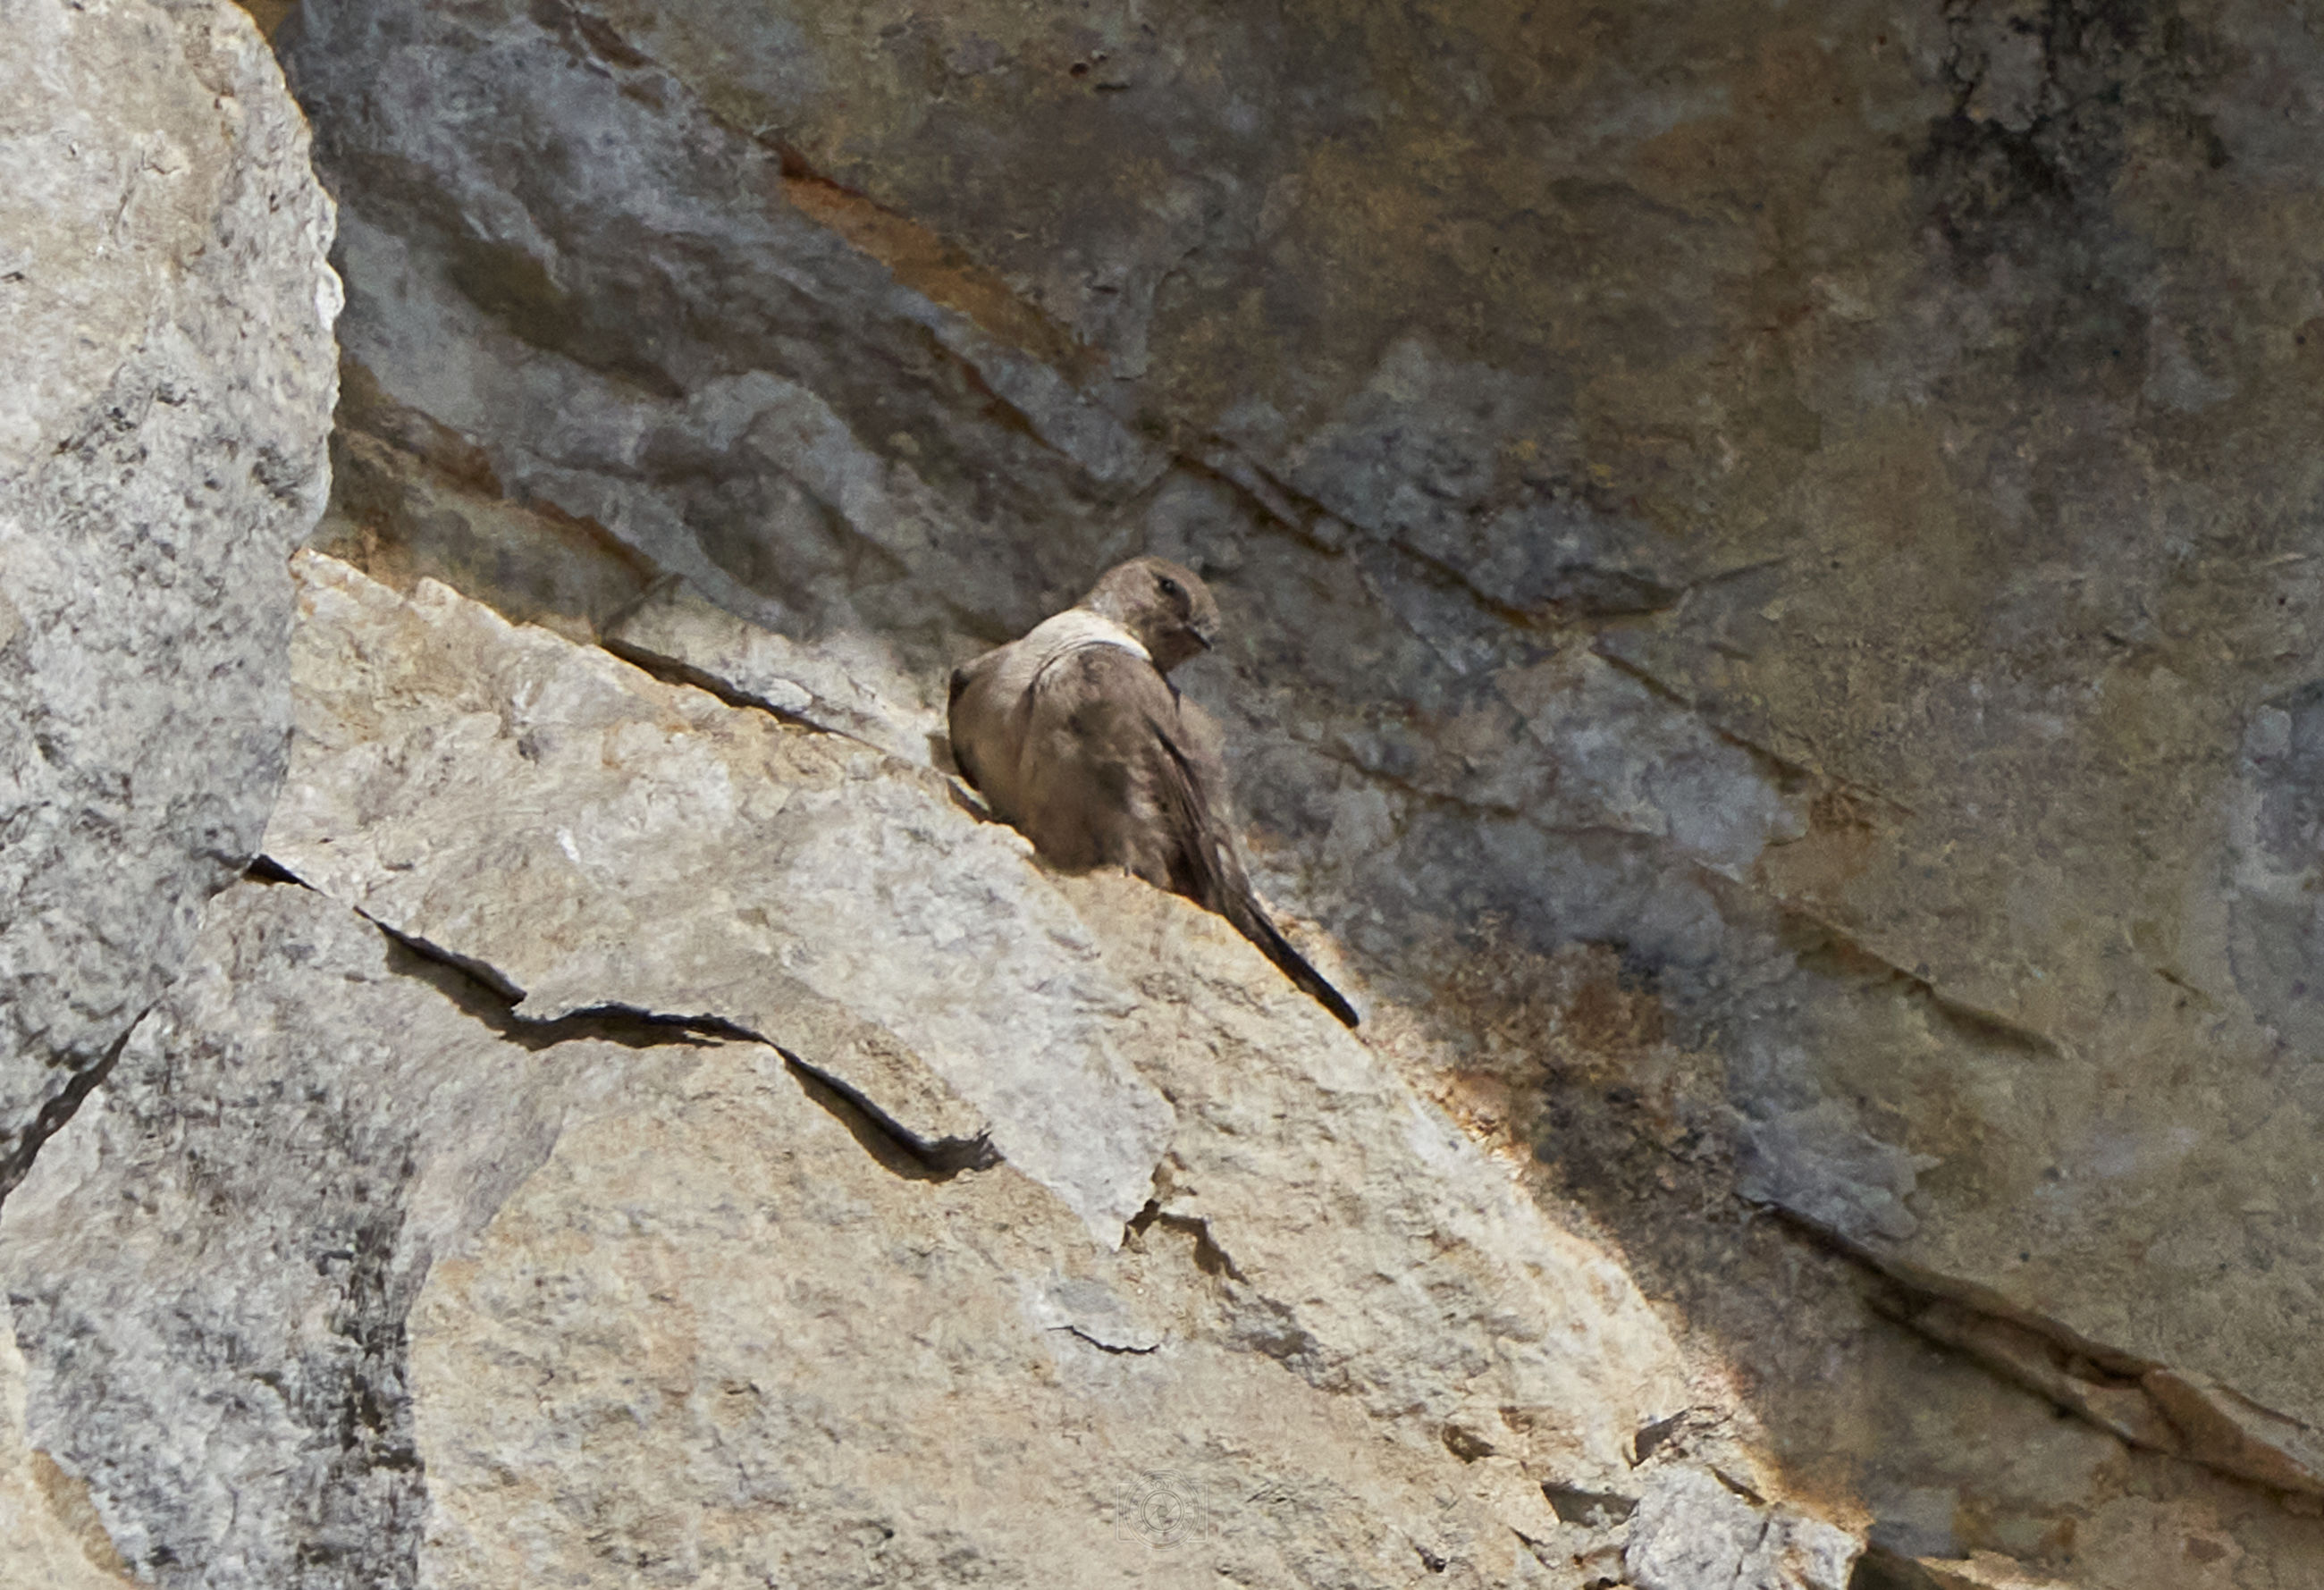 animal themes, animal, rock, wildlife, animal wildlife, bird, one animal, no people, nature, day, outdoors, rock formation, geology, perching, bird of prey, textured, wall, mammal